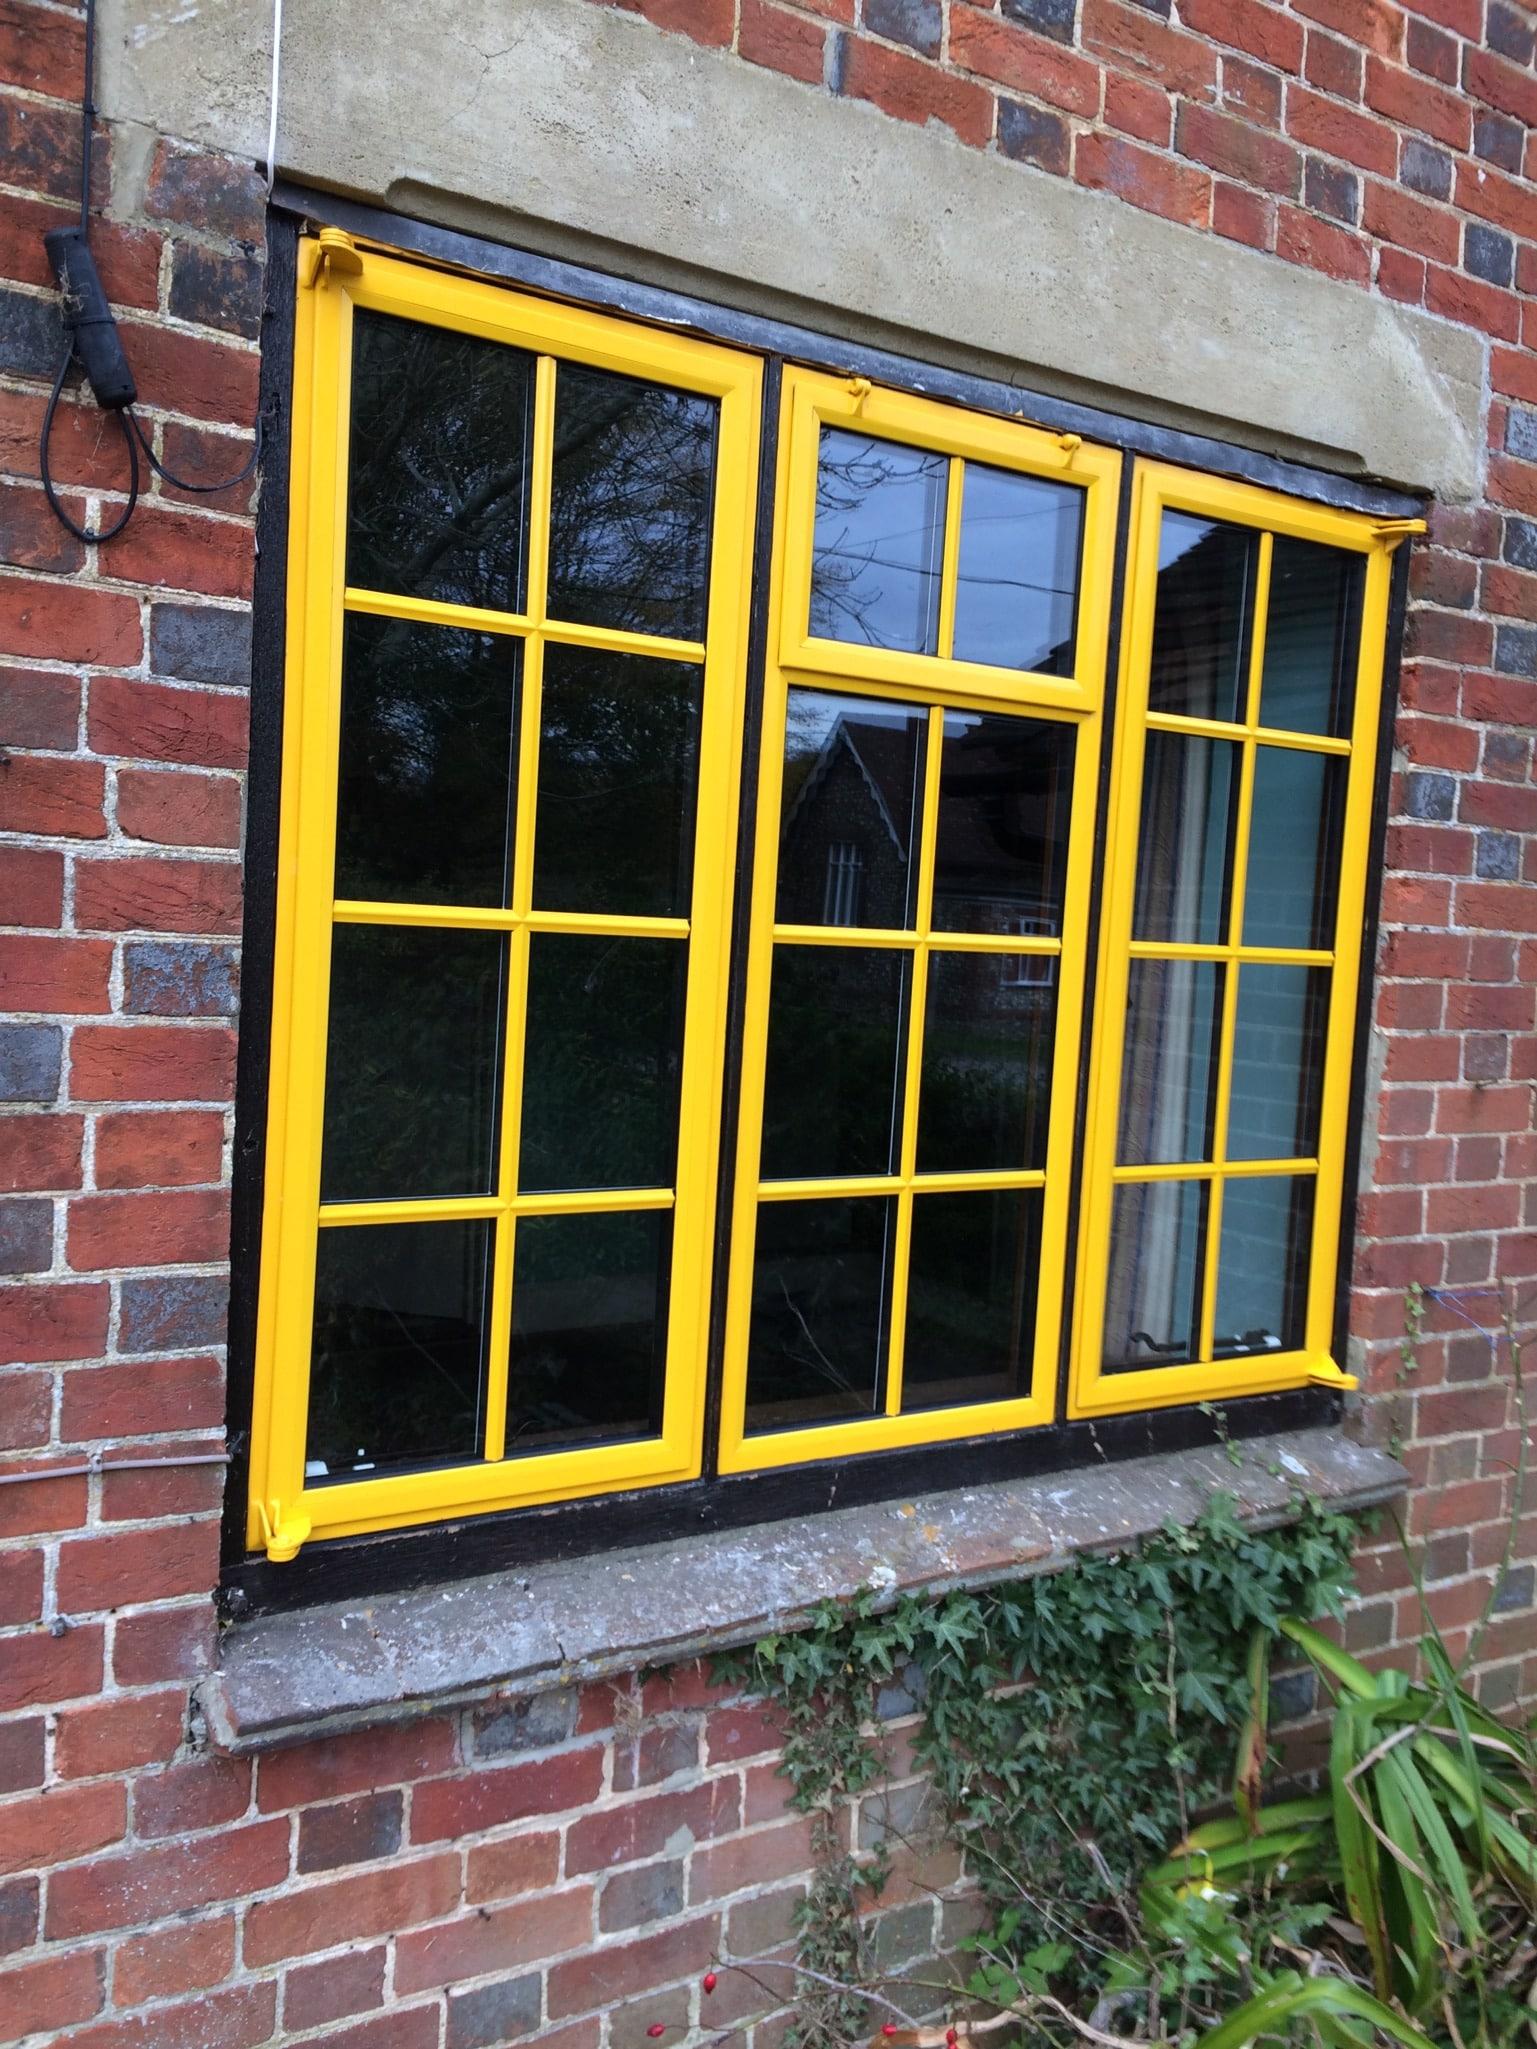 Yellow metal windows